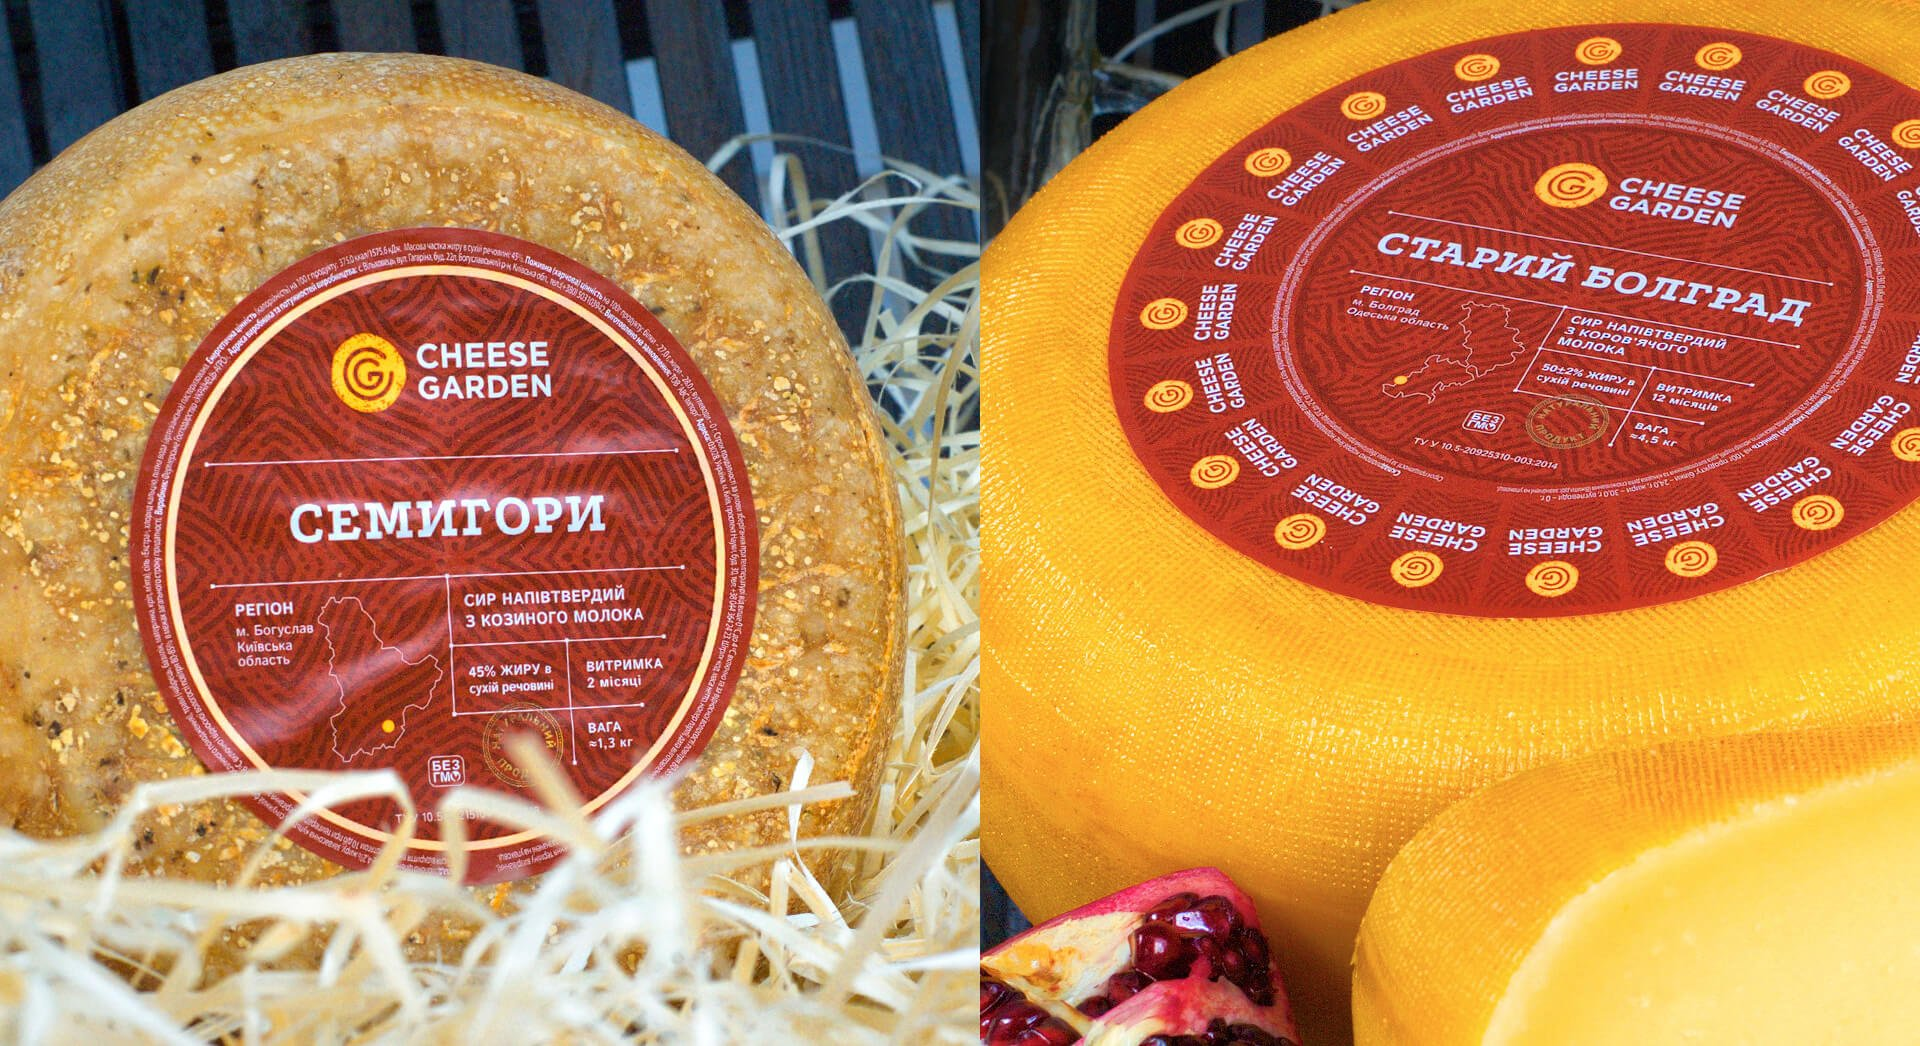 Дизайн етикеток сирів для бренду «Cheese Garden»